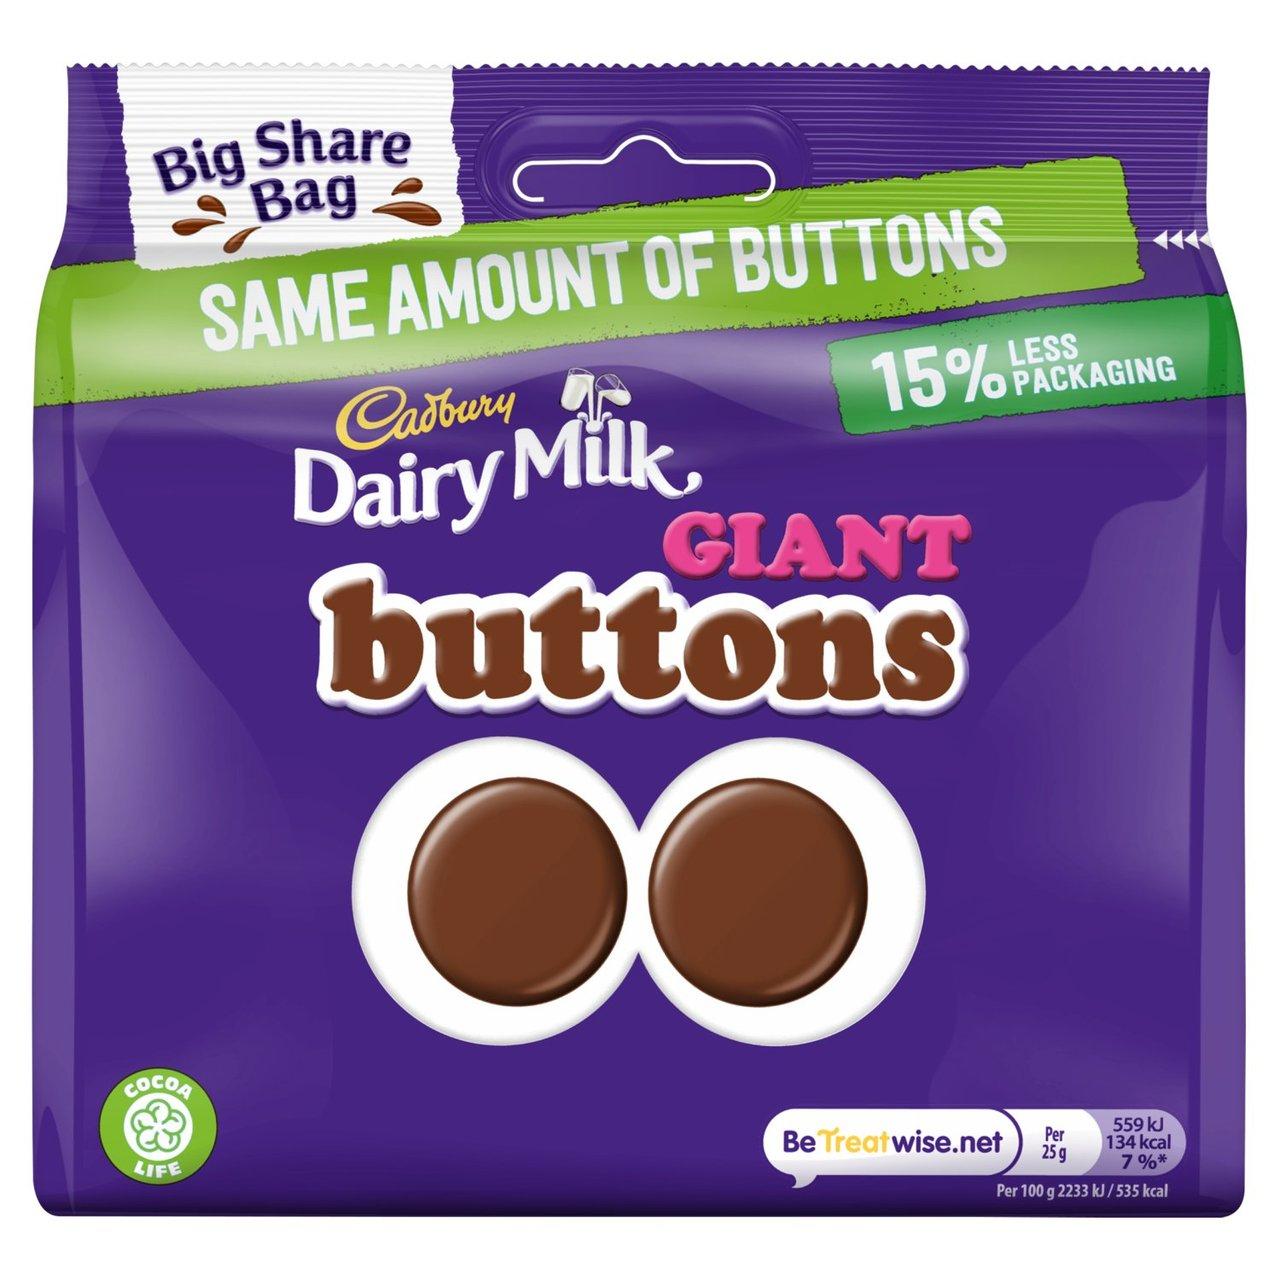 Cadbury Dairy Milk Giant Buttons 240g / Bitsa Wispa 222g / Caramel Nibbles 242g Share Bags - £1.25 @ Asda (Llanelli)